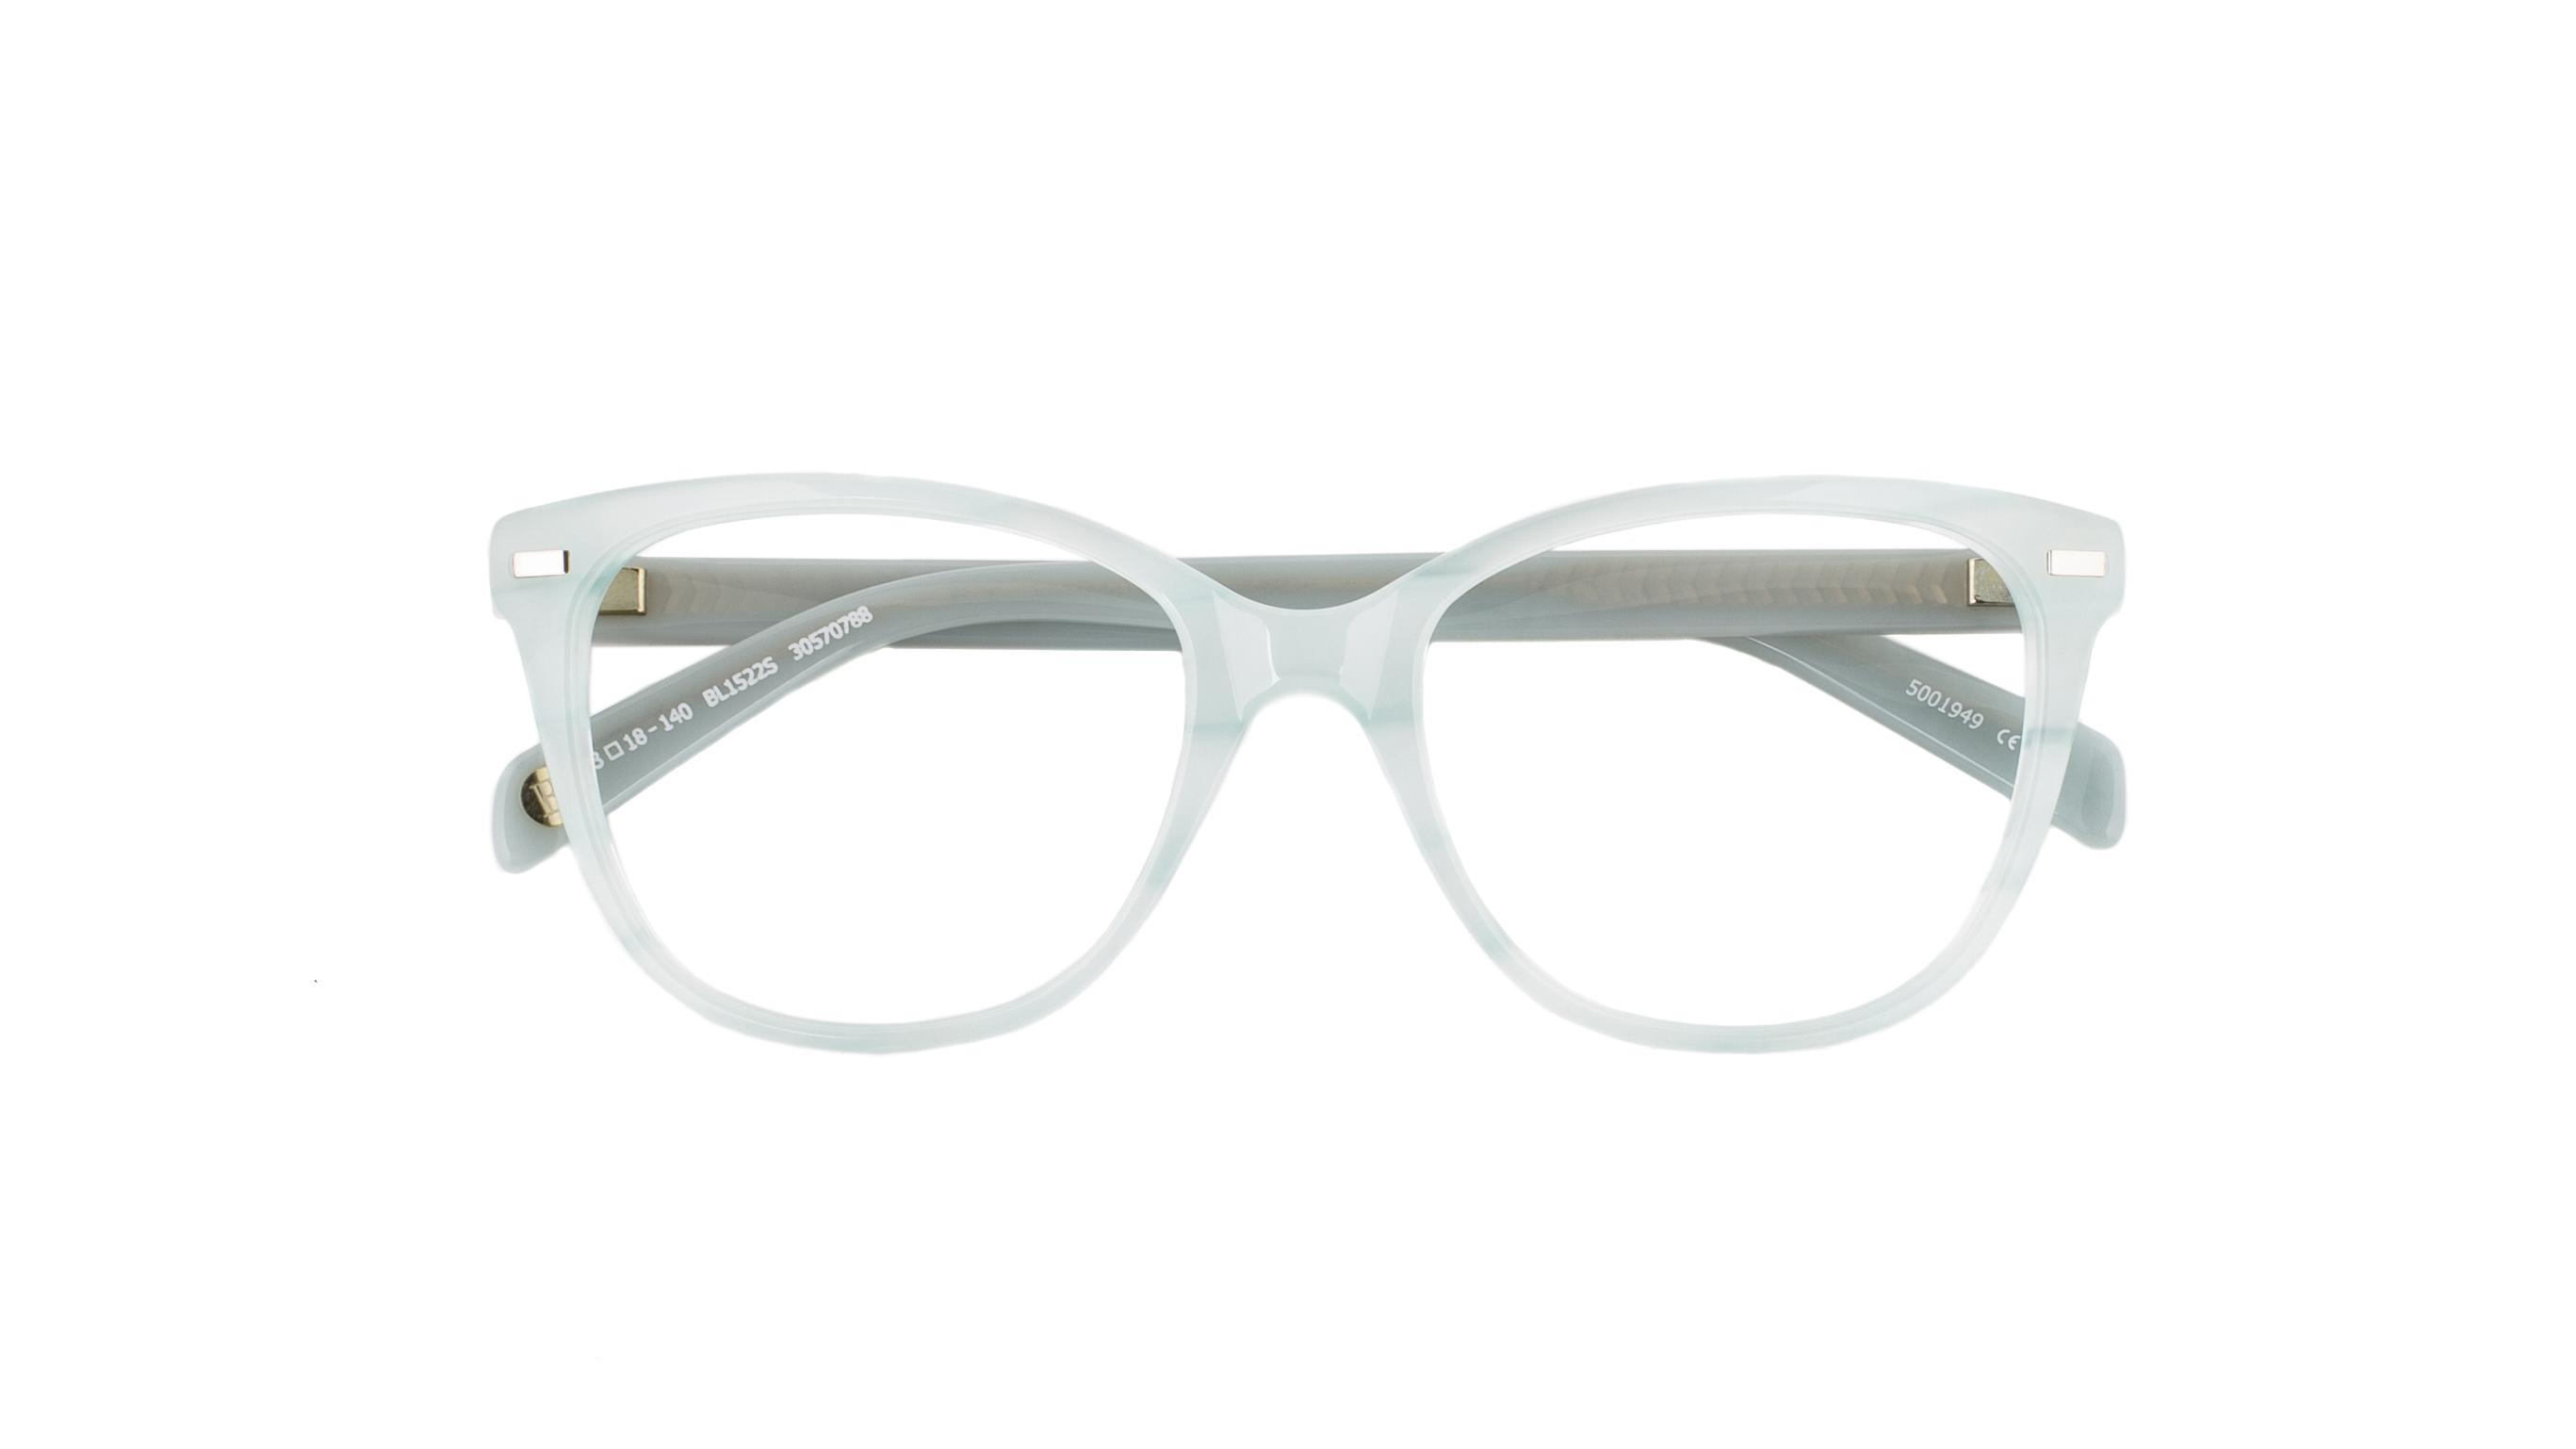 Balmain x Specsavers BL1522S 3057088 - RRP 2 pairs single vision $459